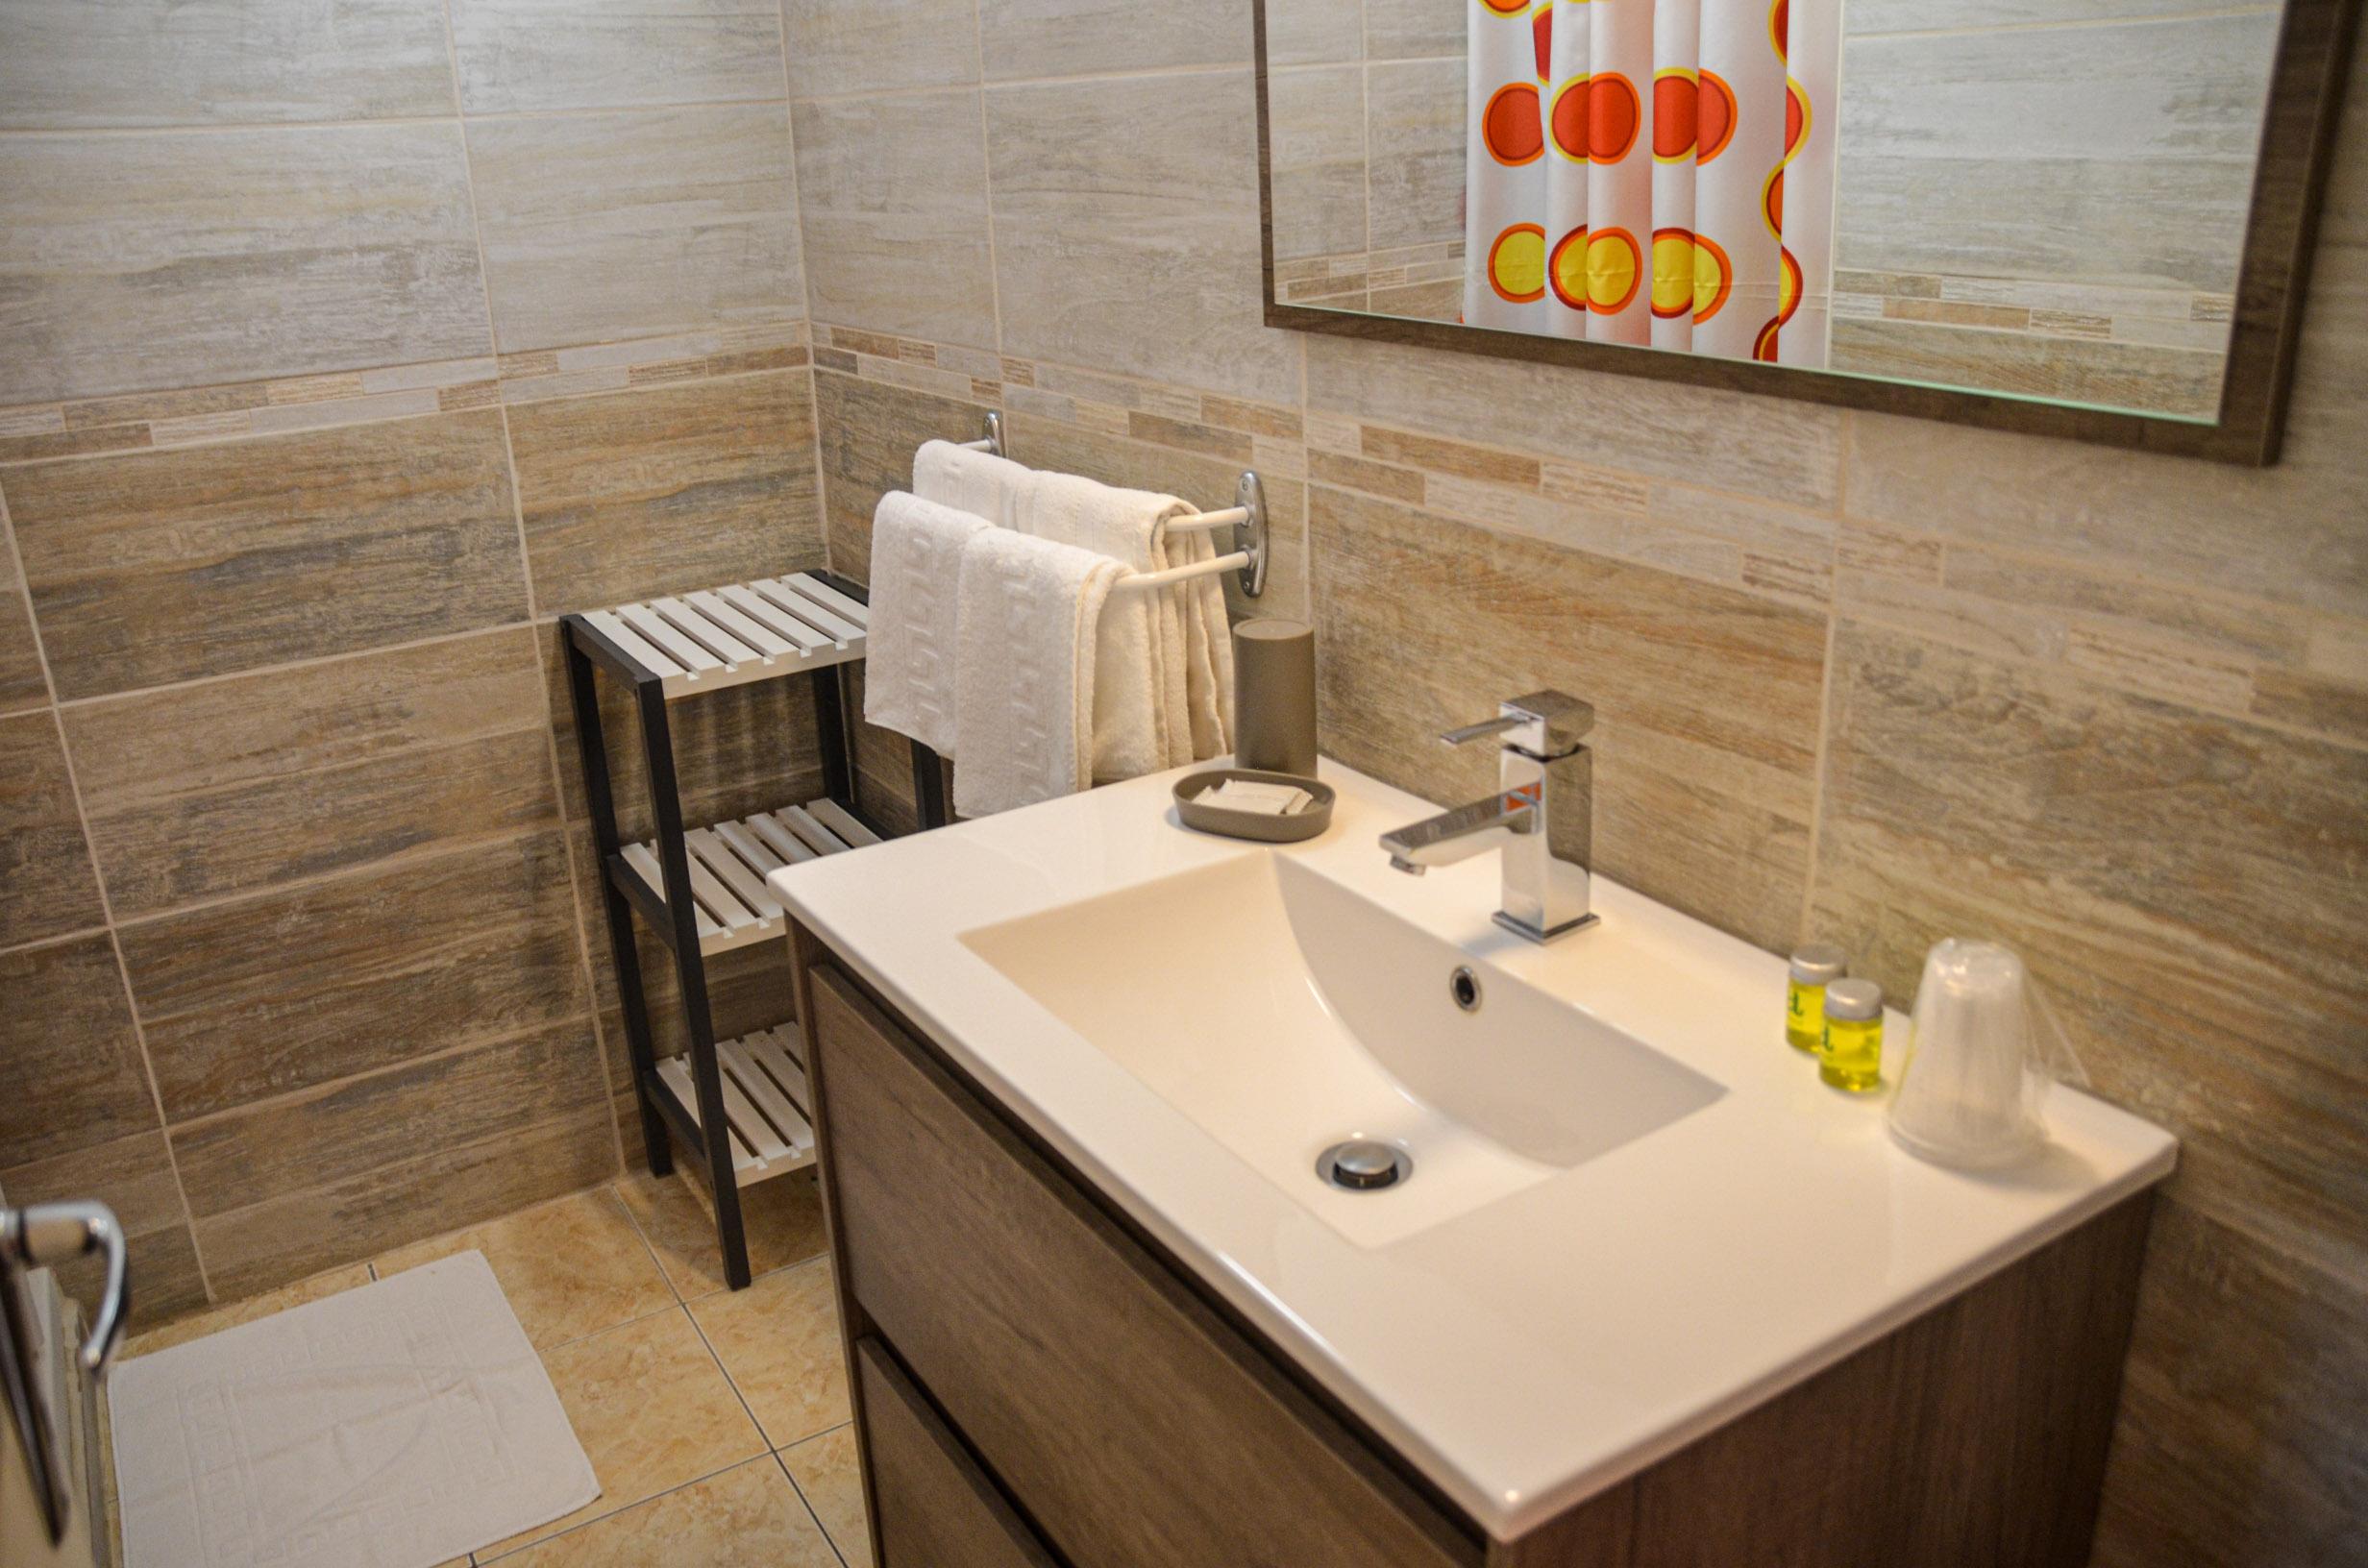 Le pech de malet salle de bain vitrac perigord Hôtel